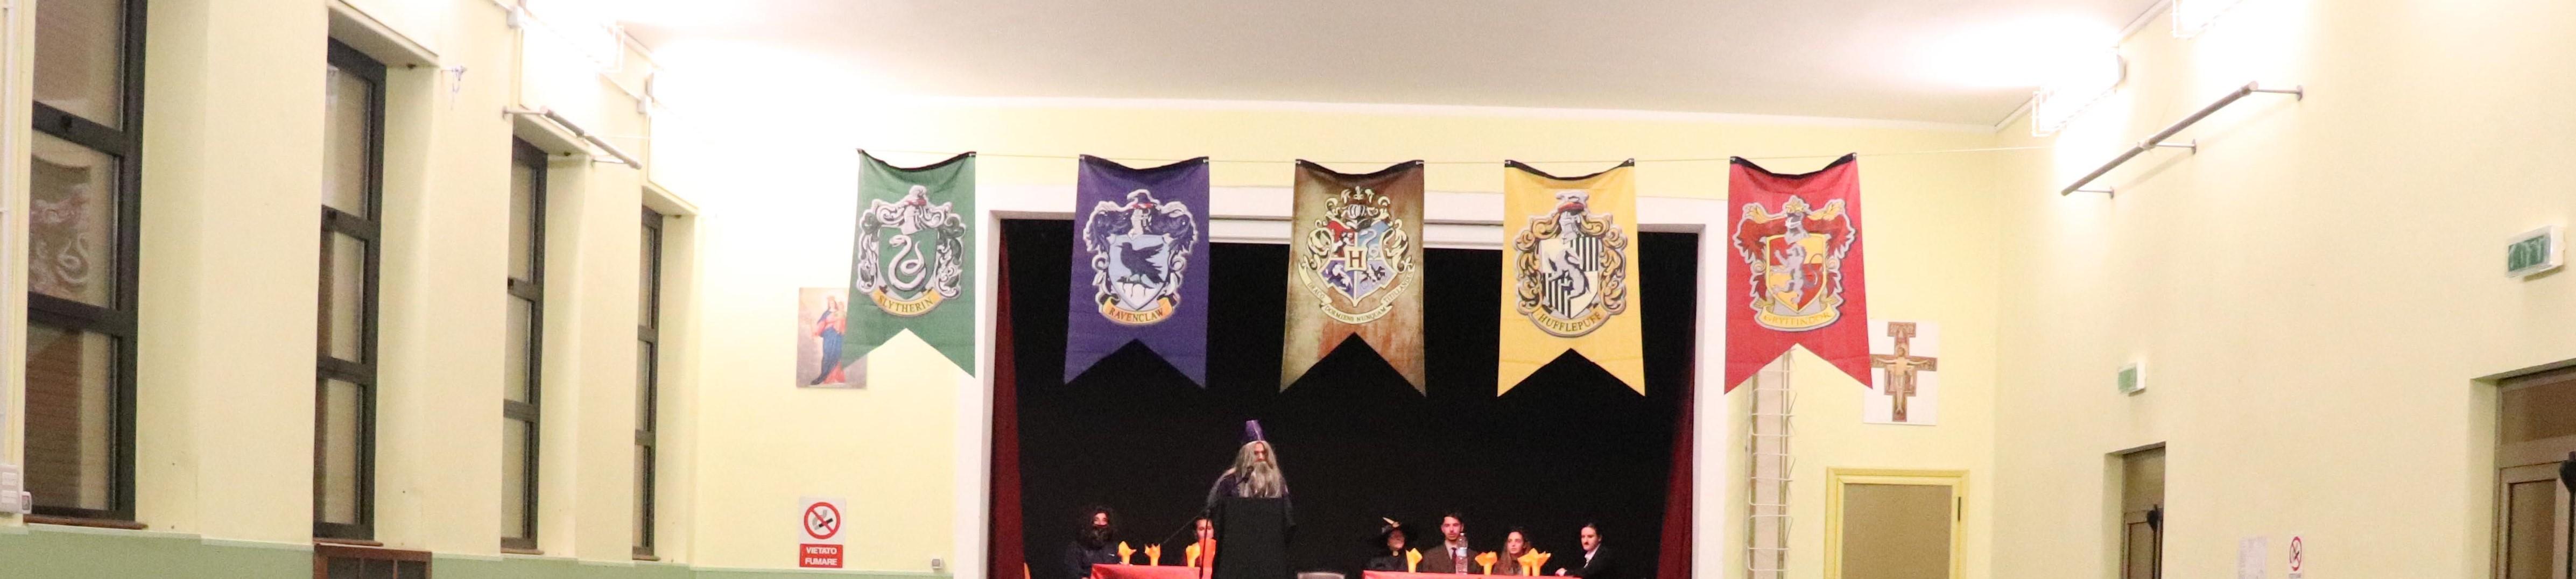 Acqui Terme: Carnevale a Hogwarts